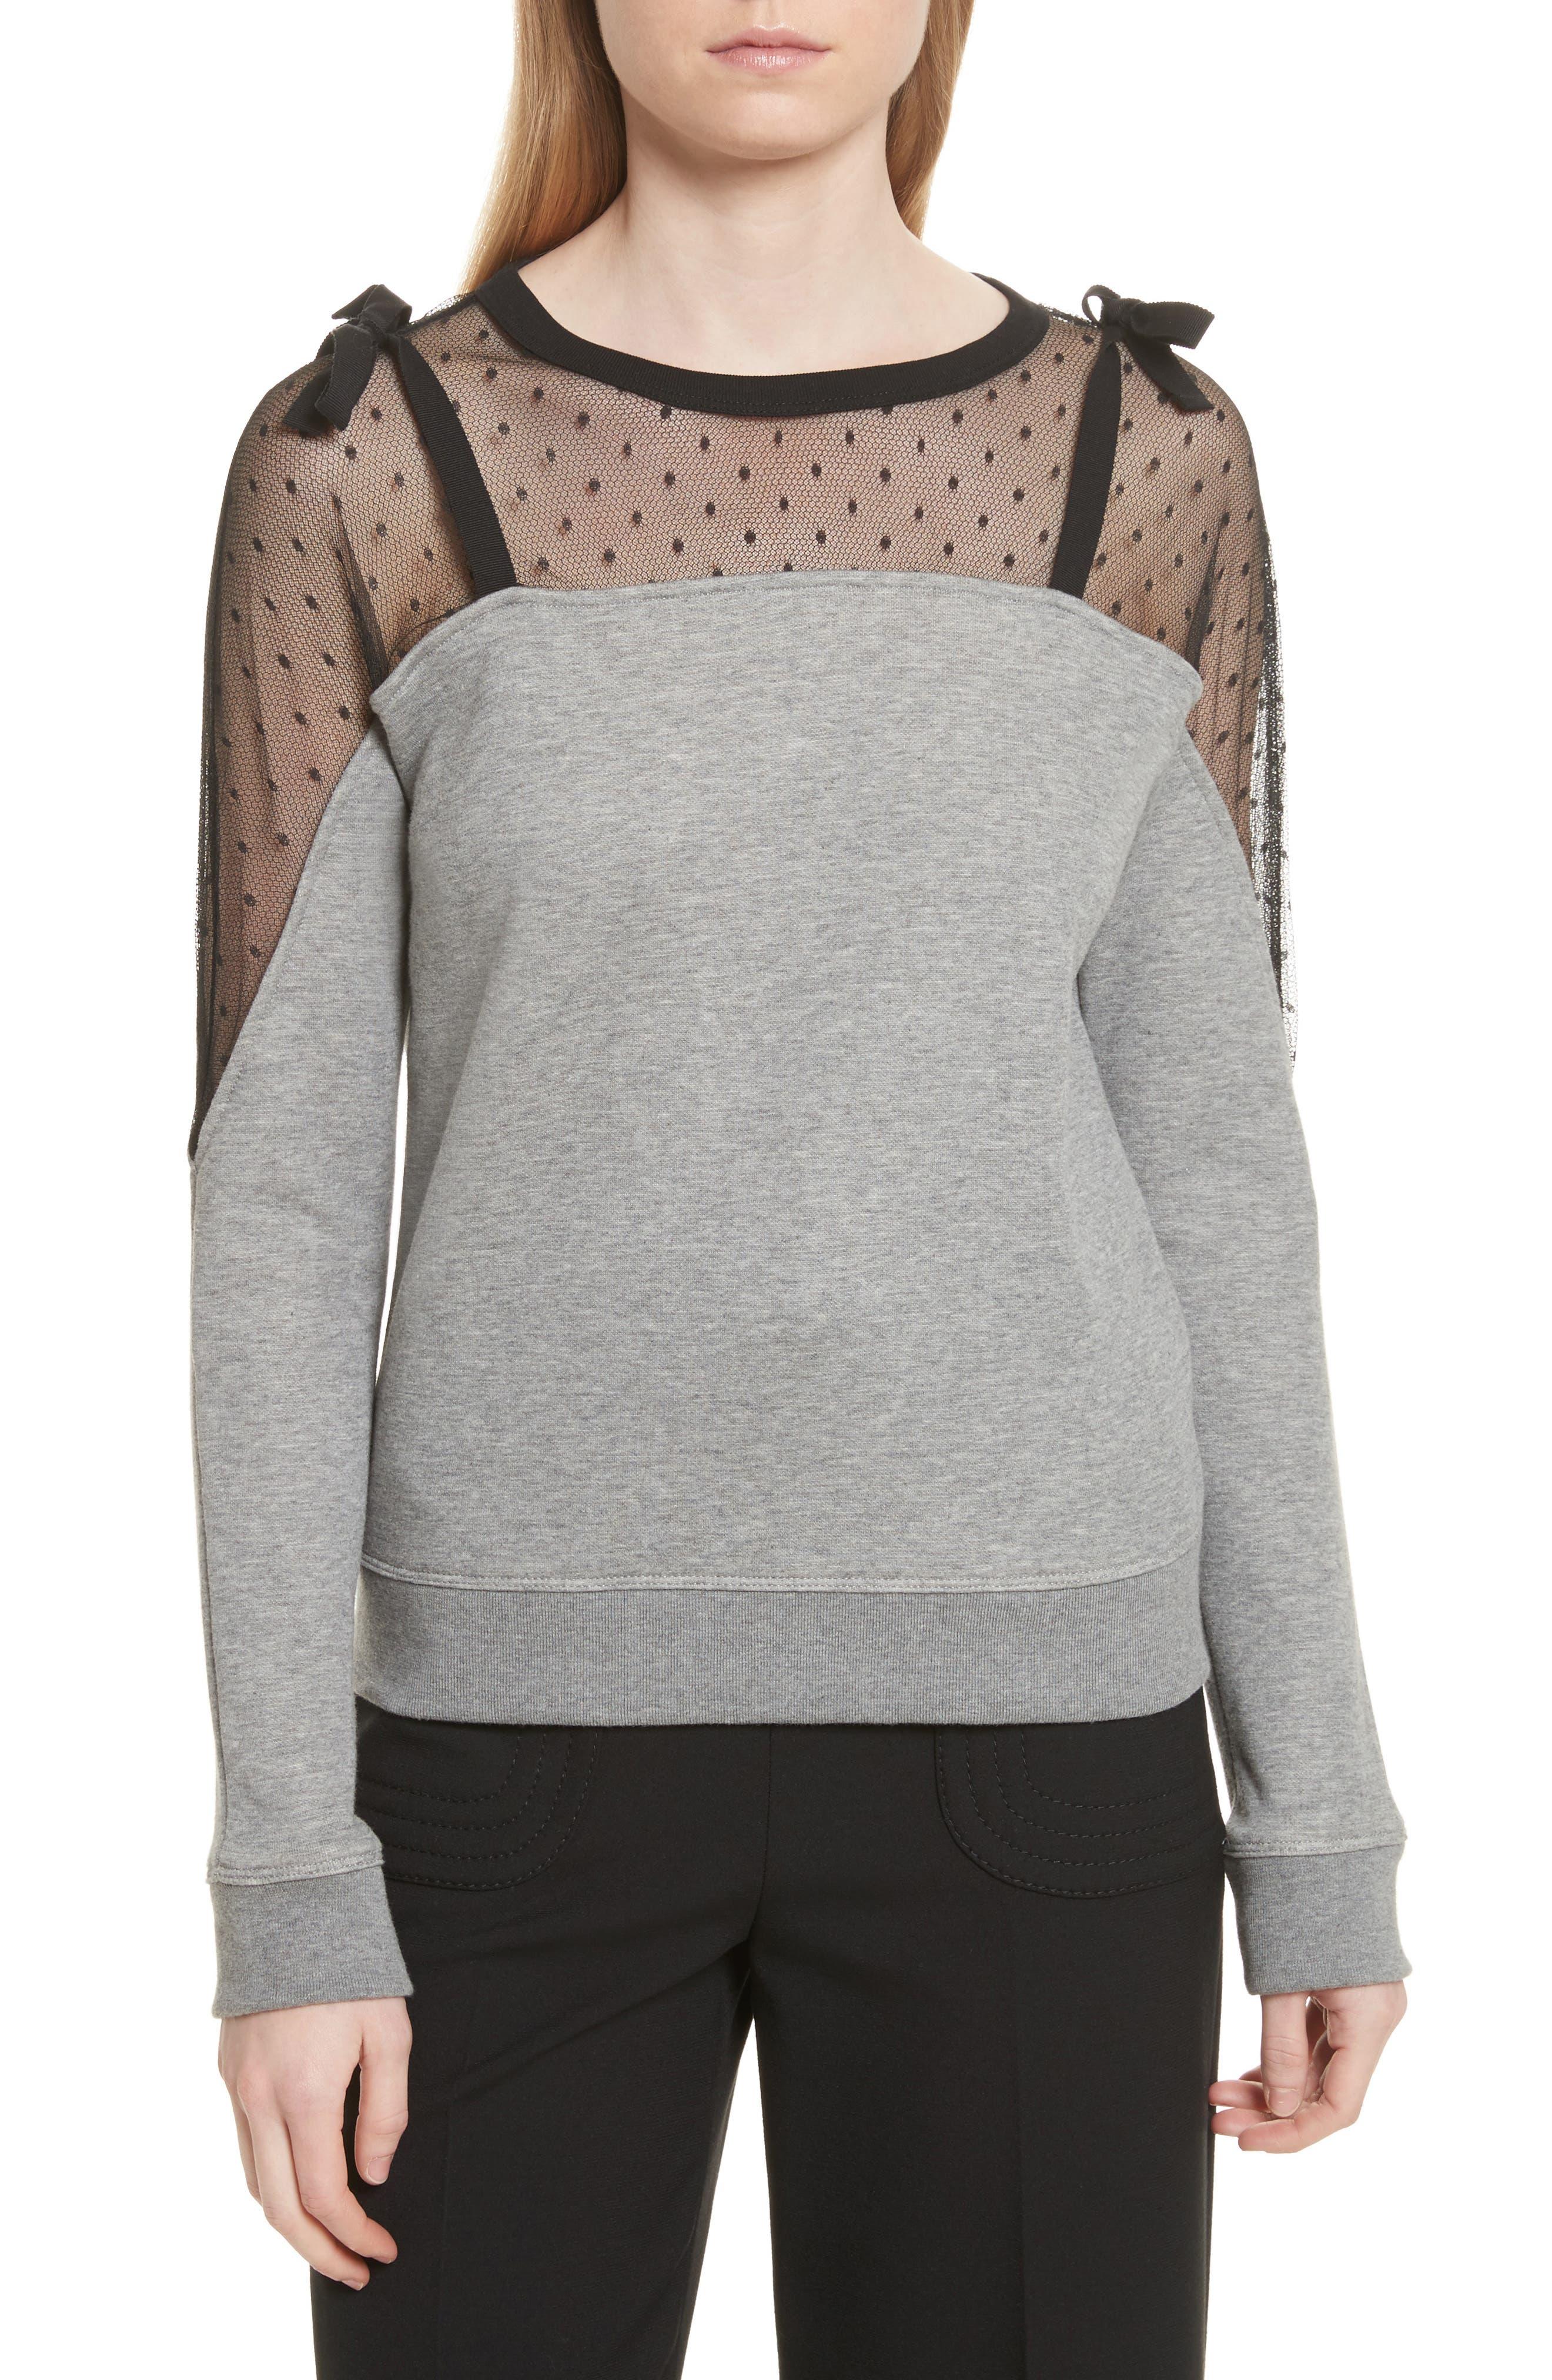 Point D'esprit Sweatshirt,                         Main,                         color, Grey